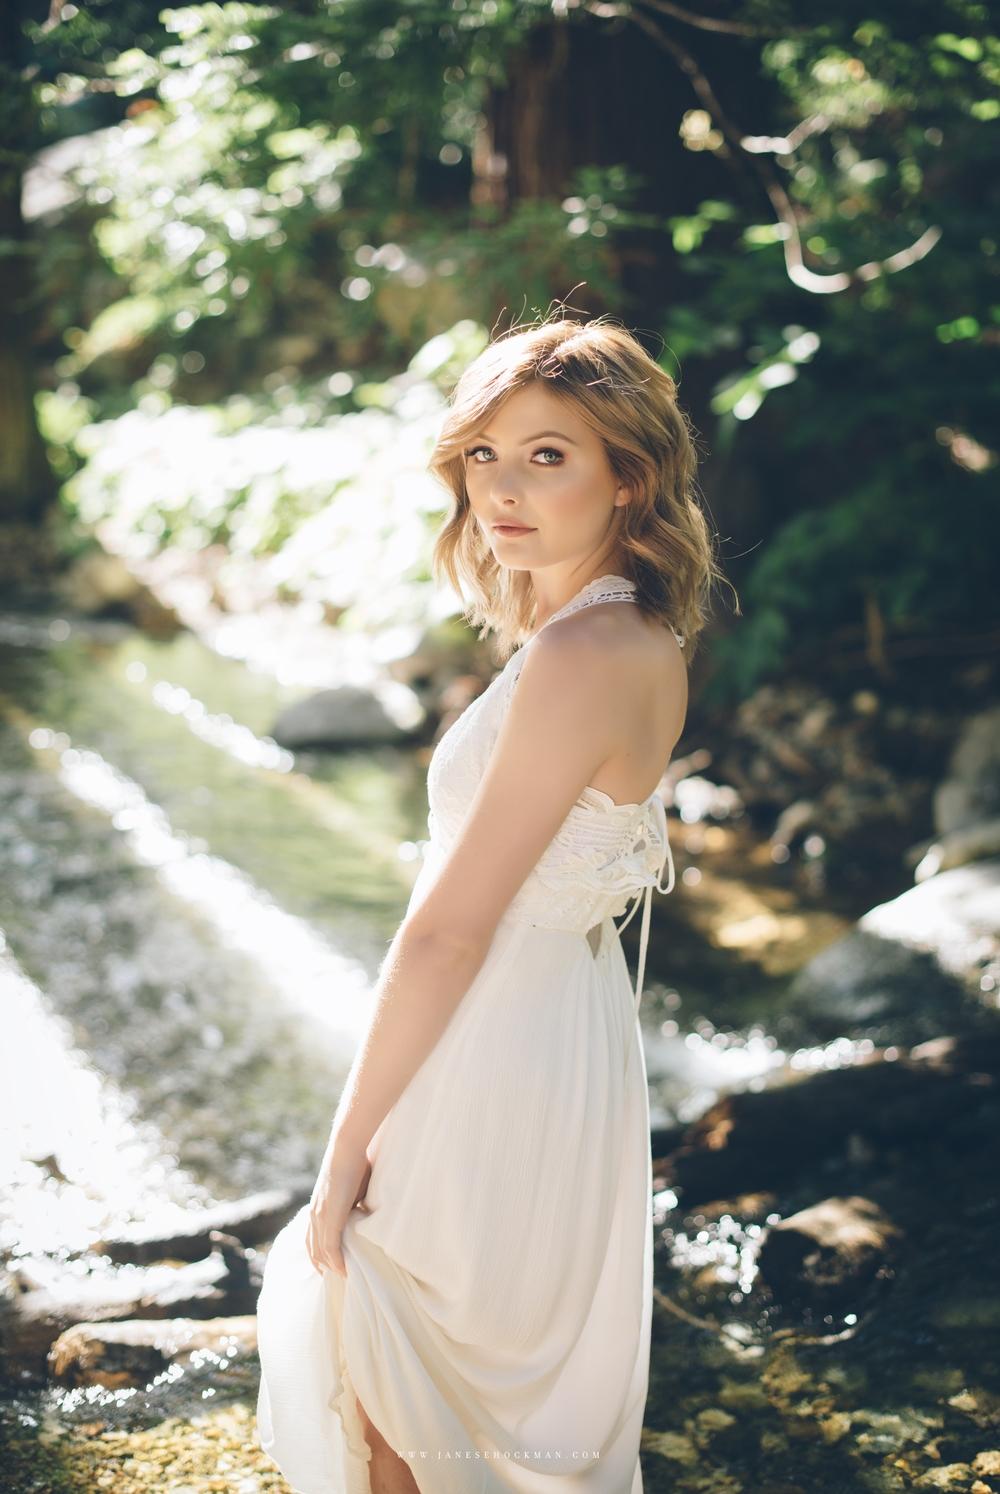 Janese Hockman Photography San Luis Obispo California High School Senior Photography 7.jpg